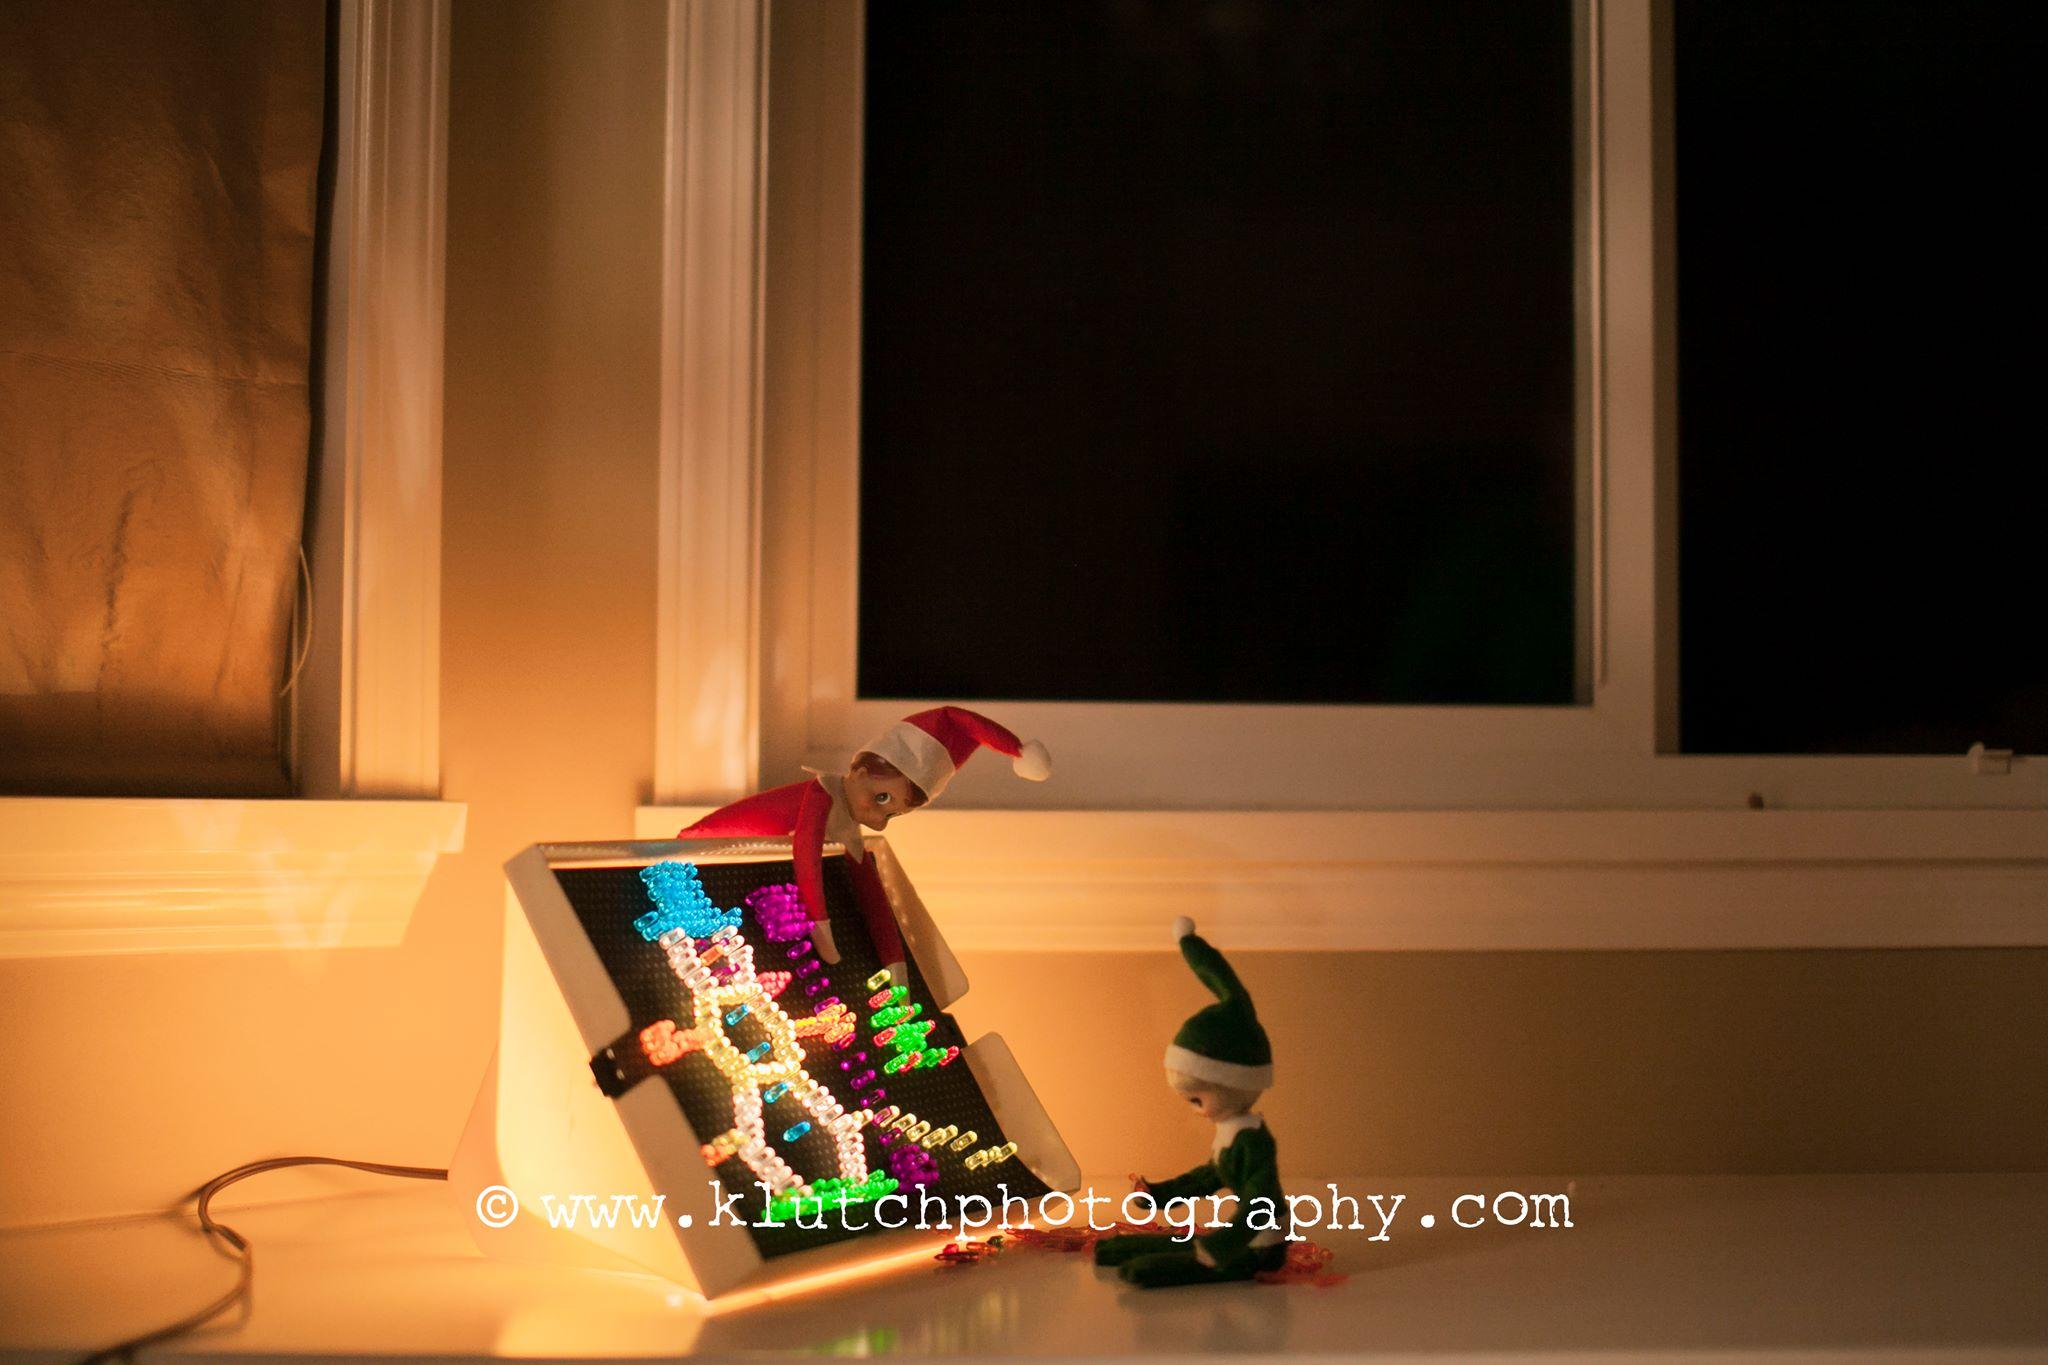 Klutch Photography, family photographer, elf on the shelf, vancouver family photographer, whiterock family photographer, lifeunscripted photographer, lifestlye photographer a.jpg